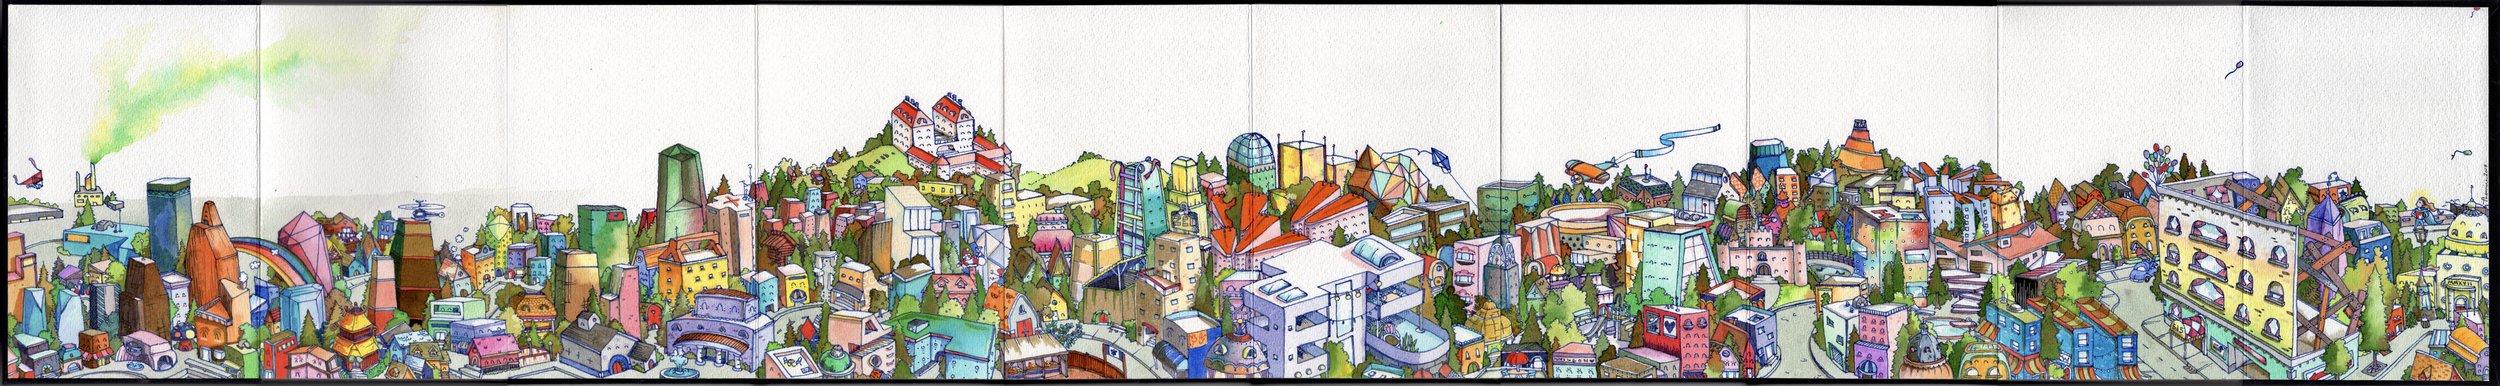 CitycolourFull.jpeg